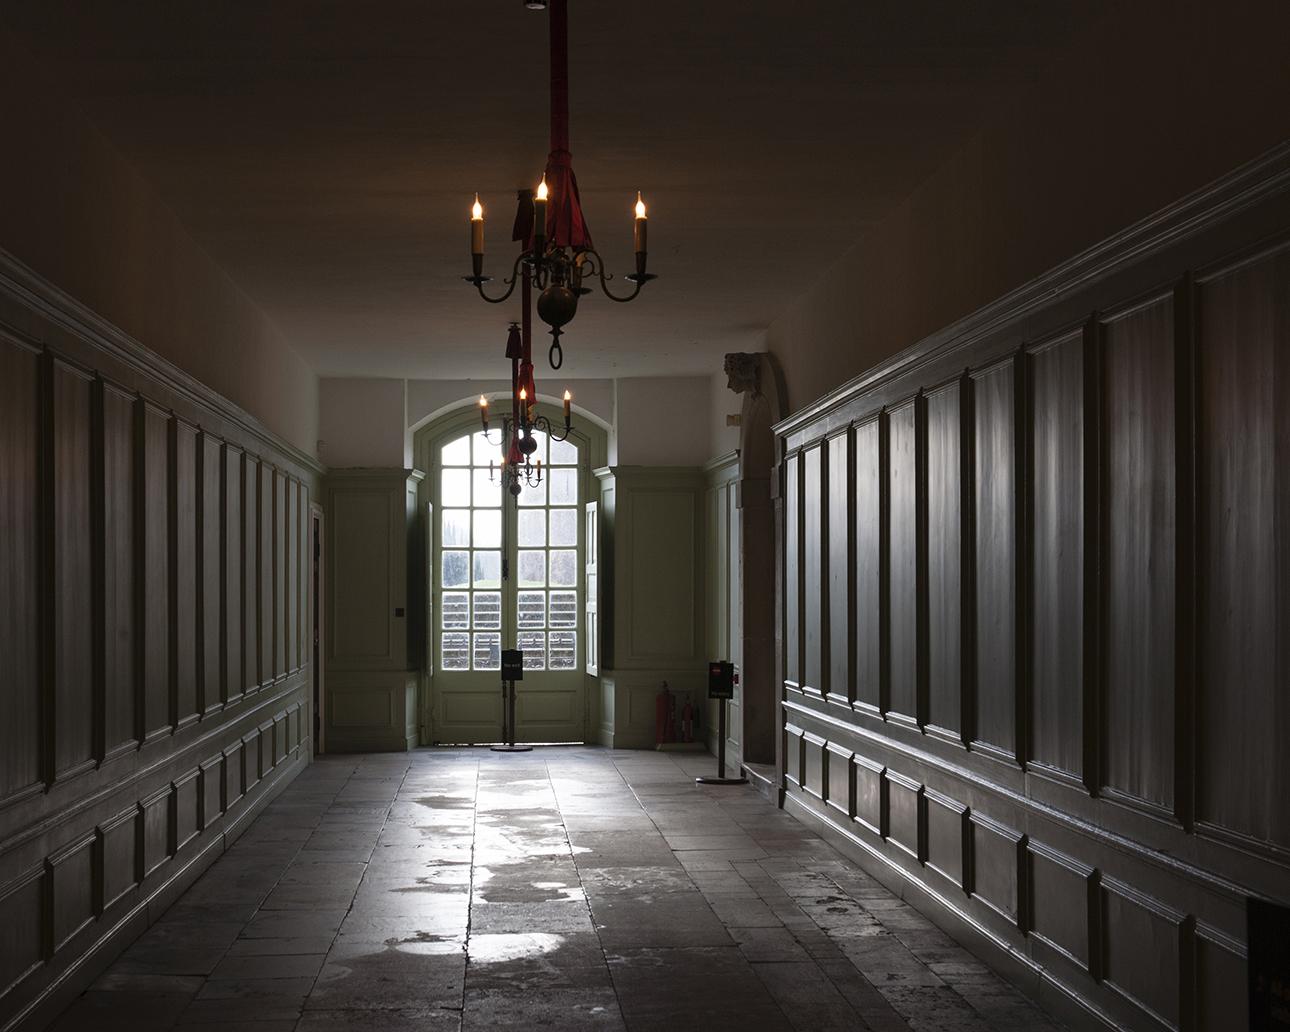 Hampton Court Interior No. 2